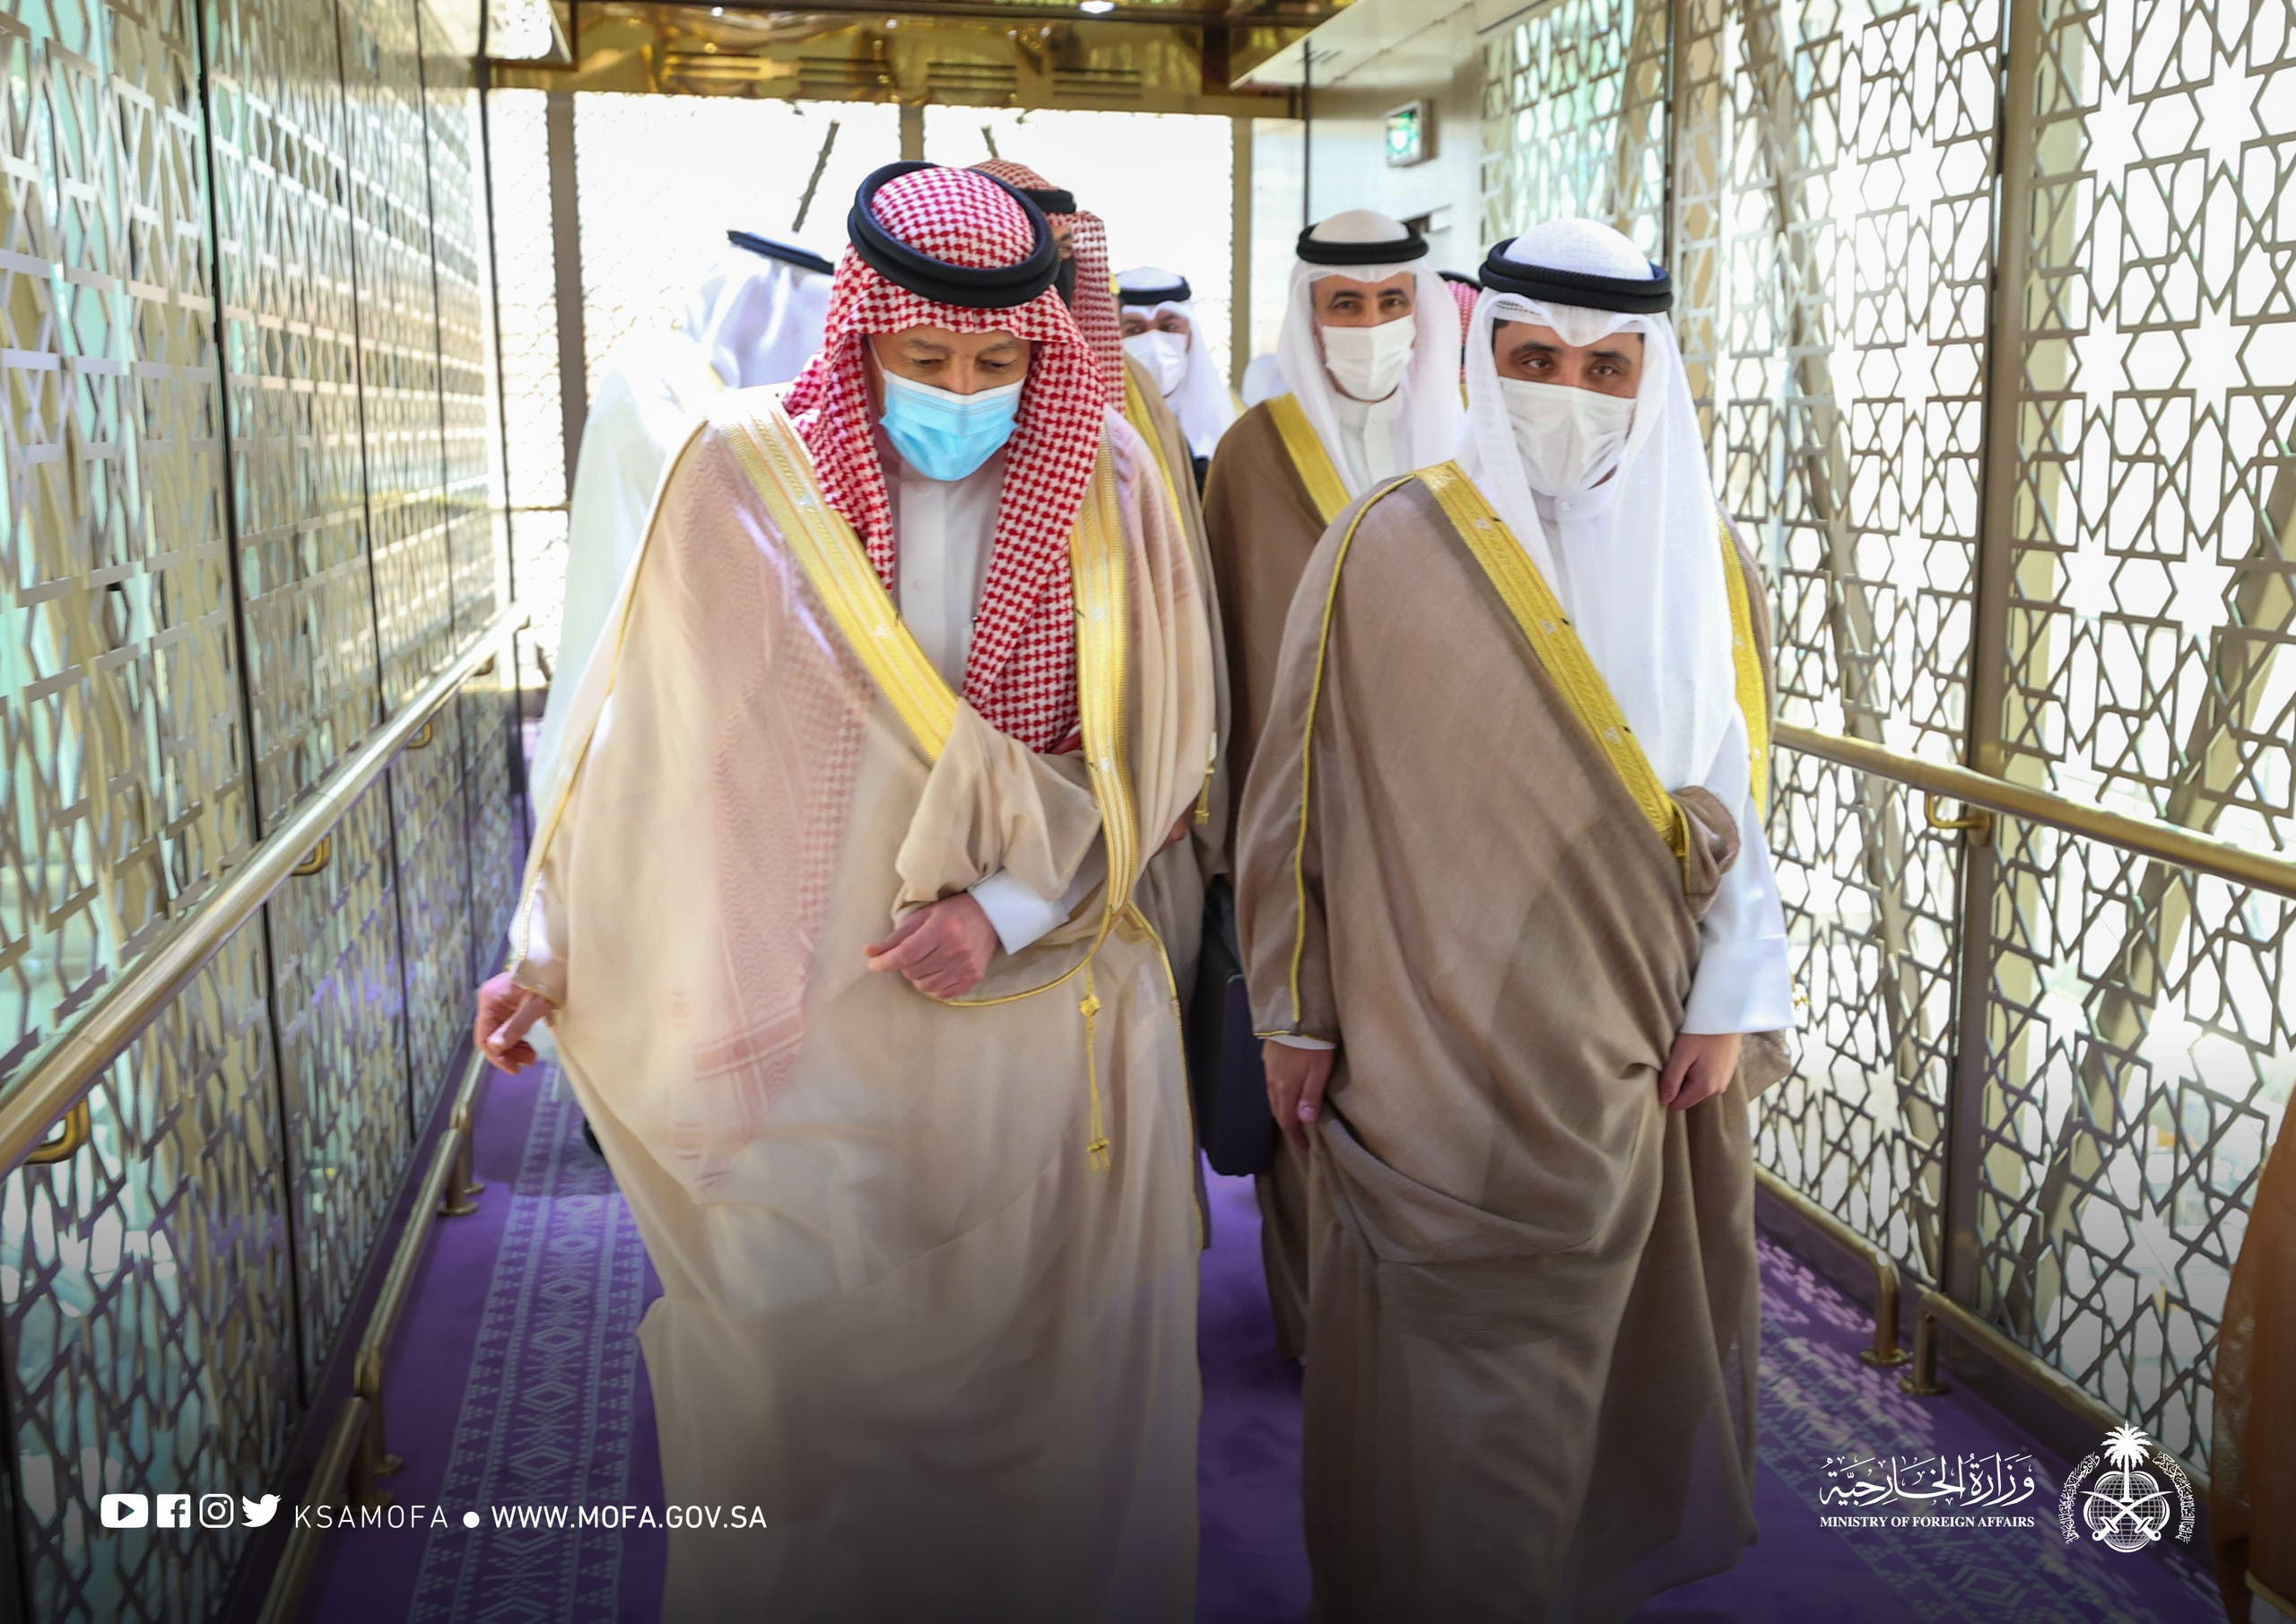 Saudi Arabia's Deputy Minister of Foreign Affairs Waleed al-Khuraiji receives Kuwait's Minister of Foreign Affairs. (KSAMOFA)